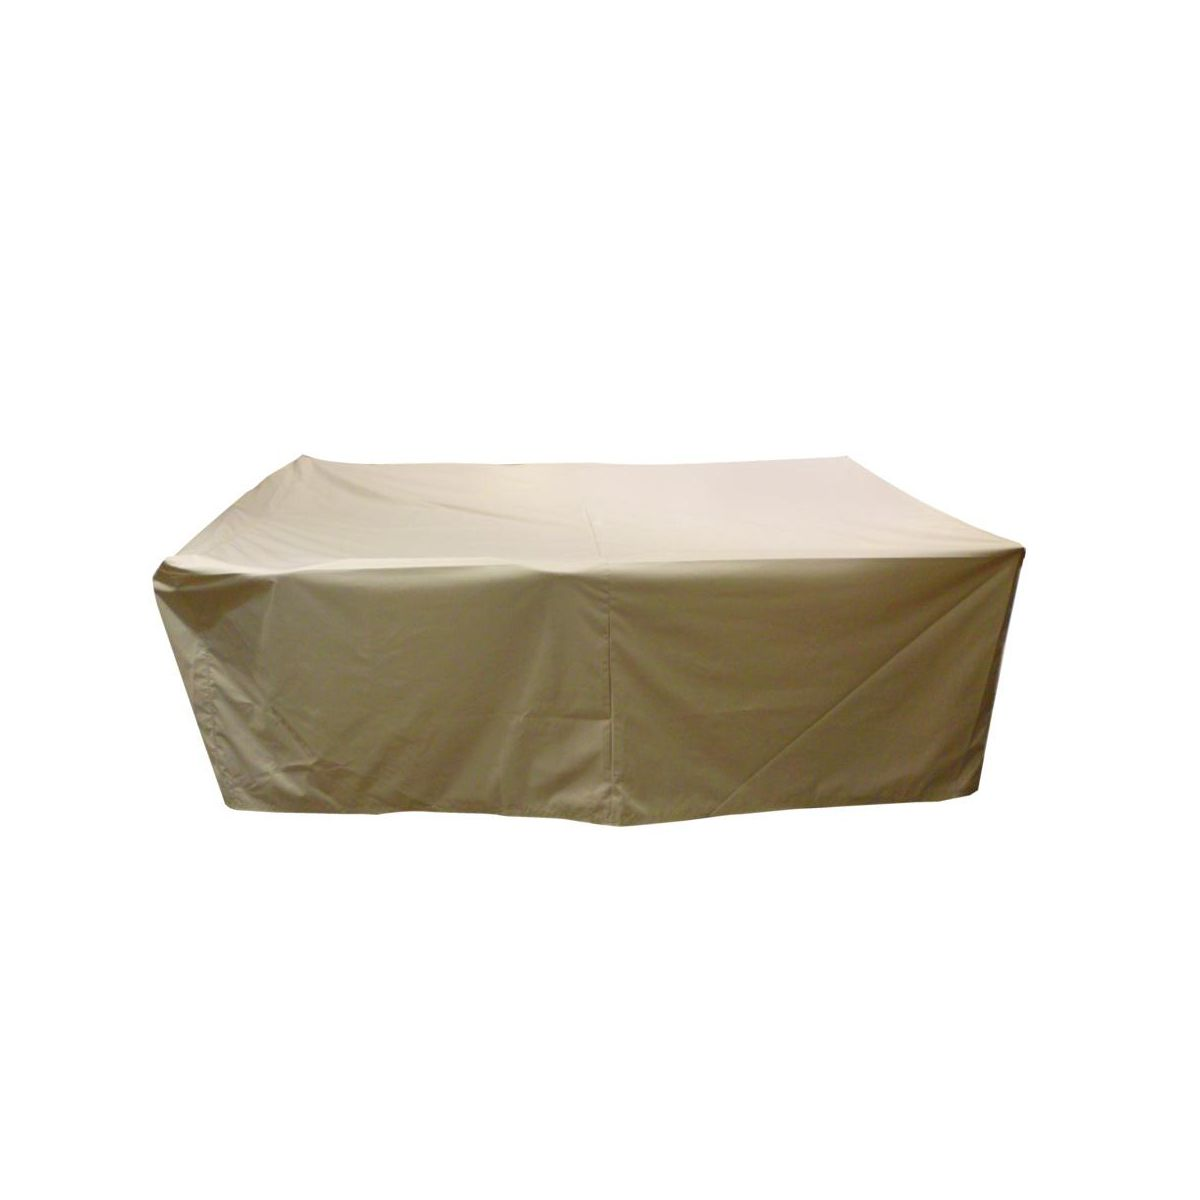 pokrowiec na zestaw mebli d 230 x szer 153 x wys 77 cm. Black Bedroom Furniture Sets. Home Design Ideas